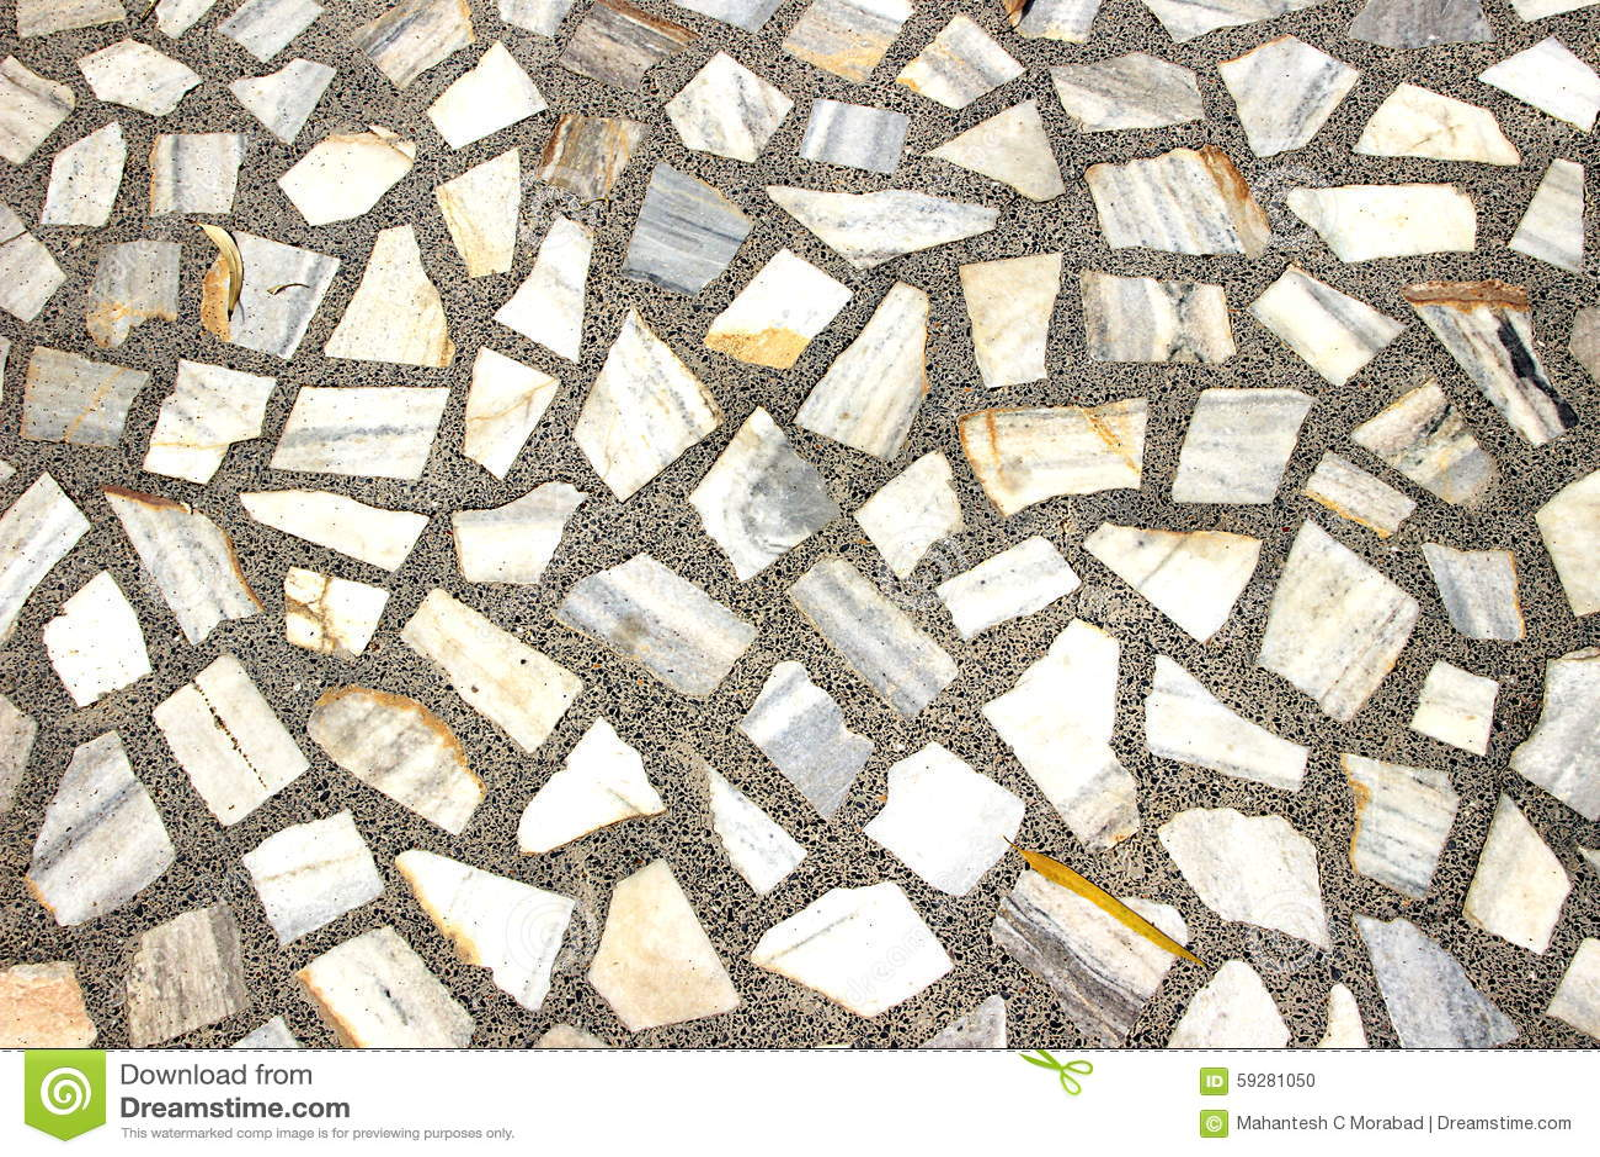 Pentagon Shaped Pattern On A Stone Floor Flooring : Stone mosaic floor pattern stock photo image